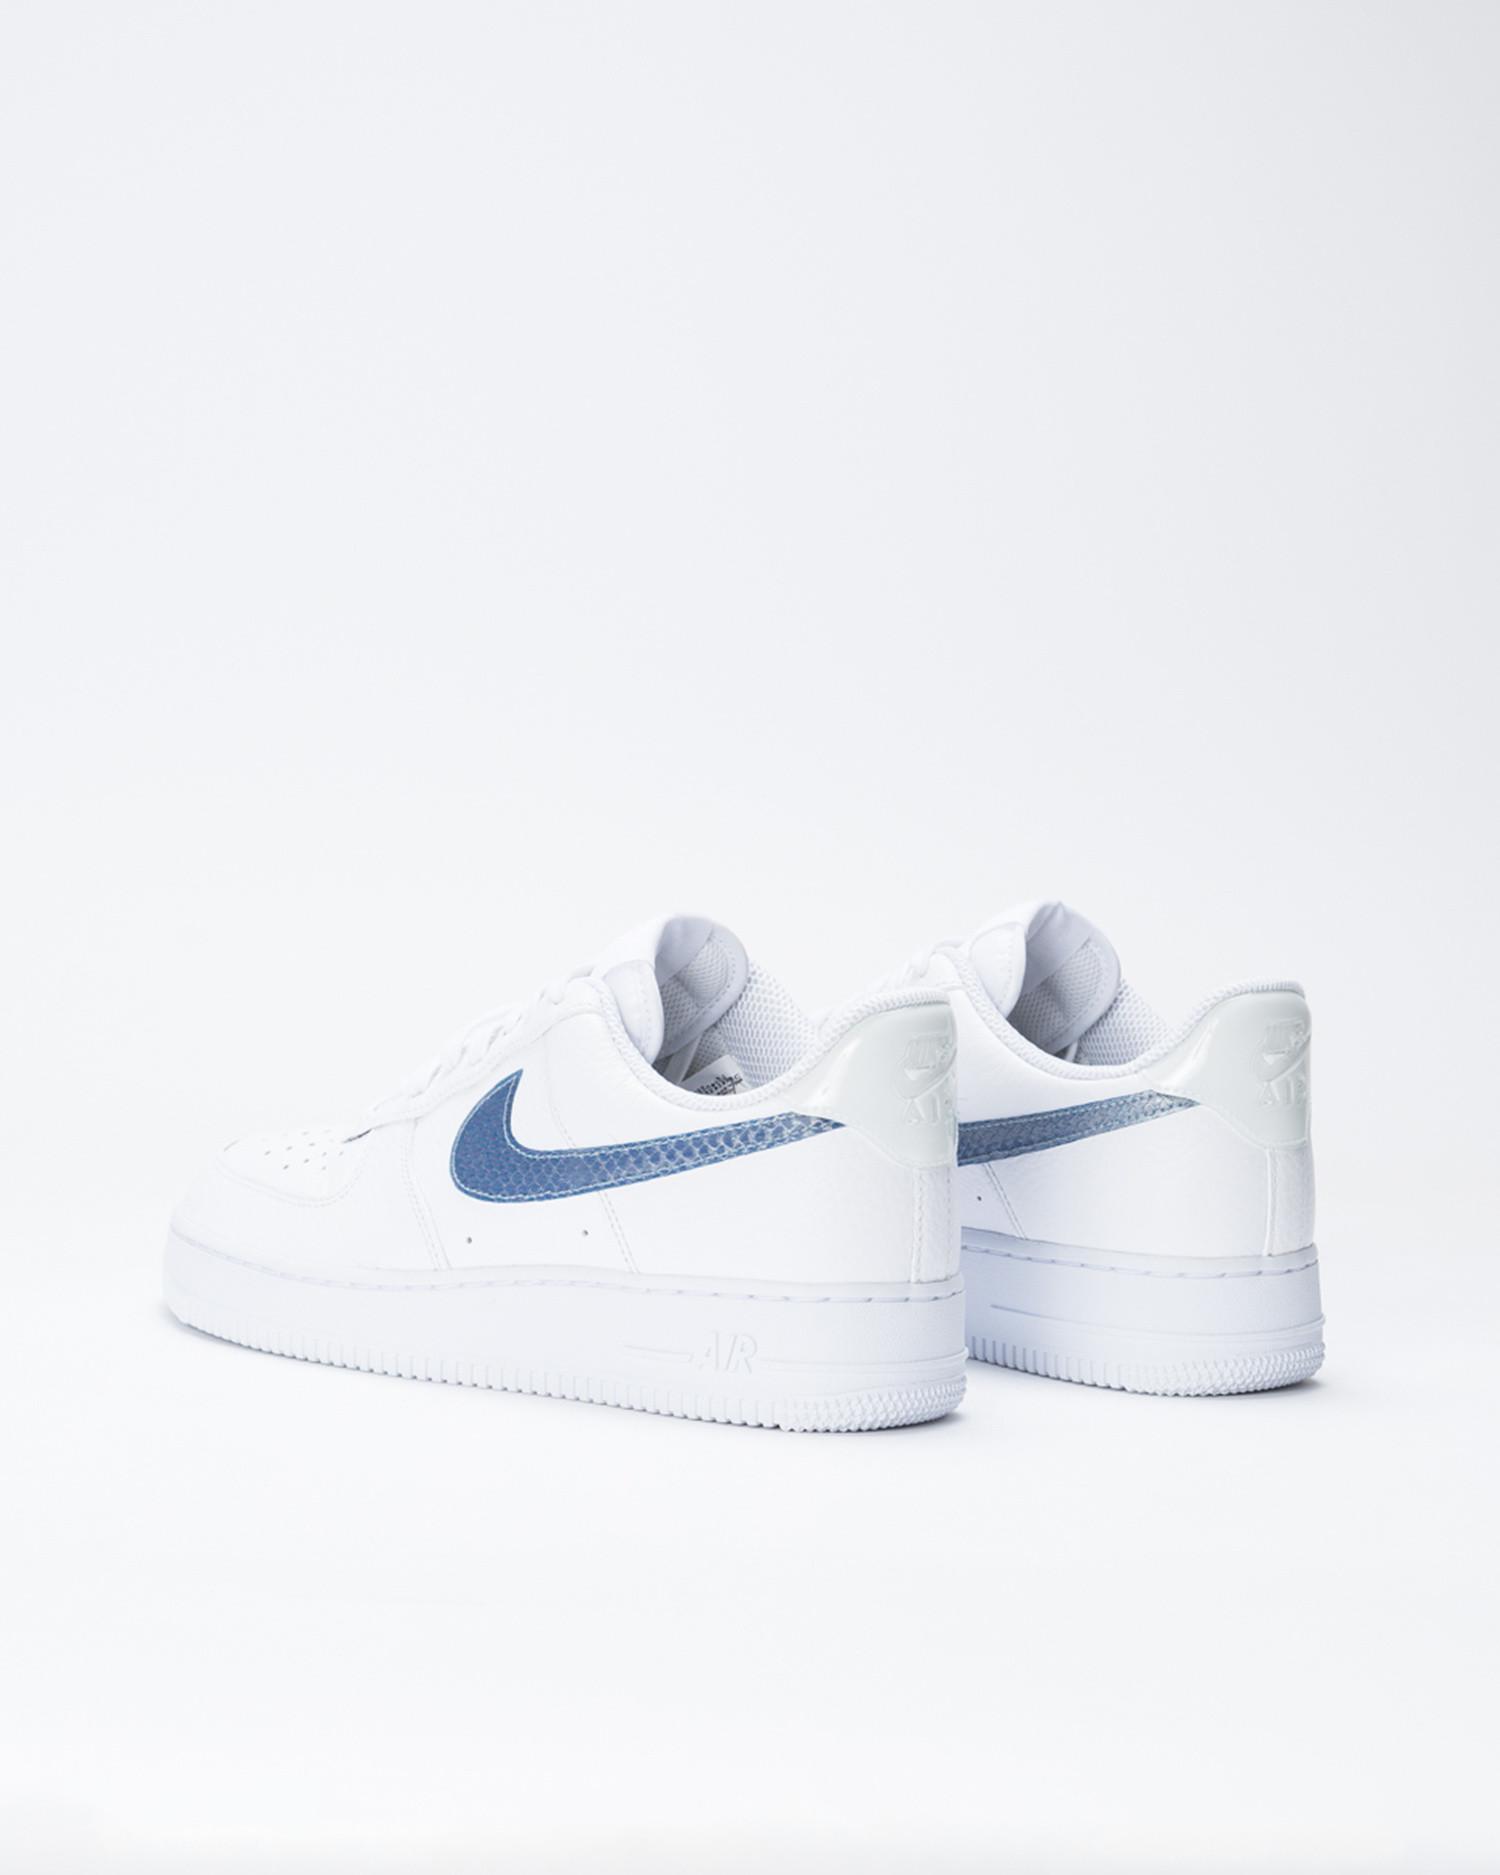 Nike Air Force 1 LV8 White/Thunderstorm/White